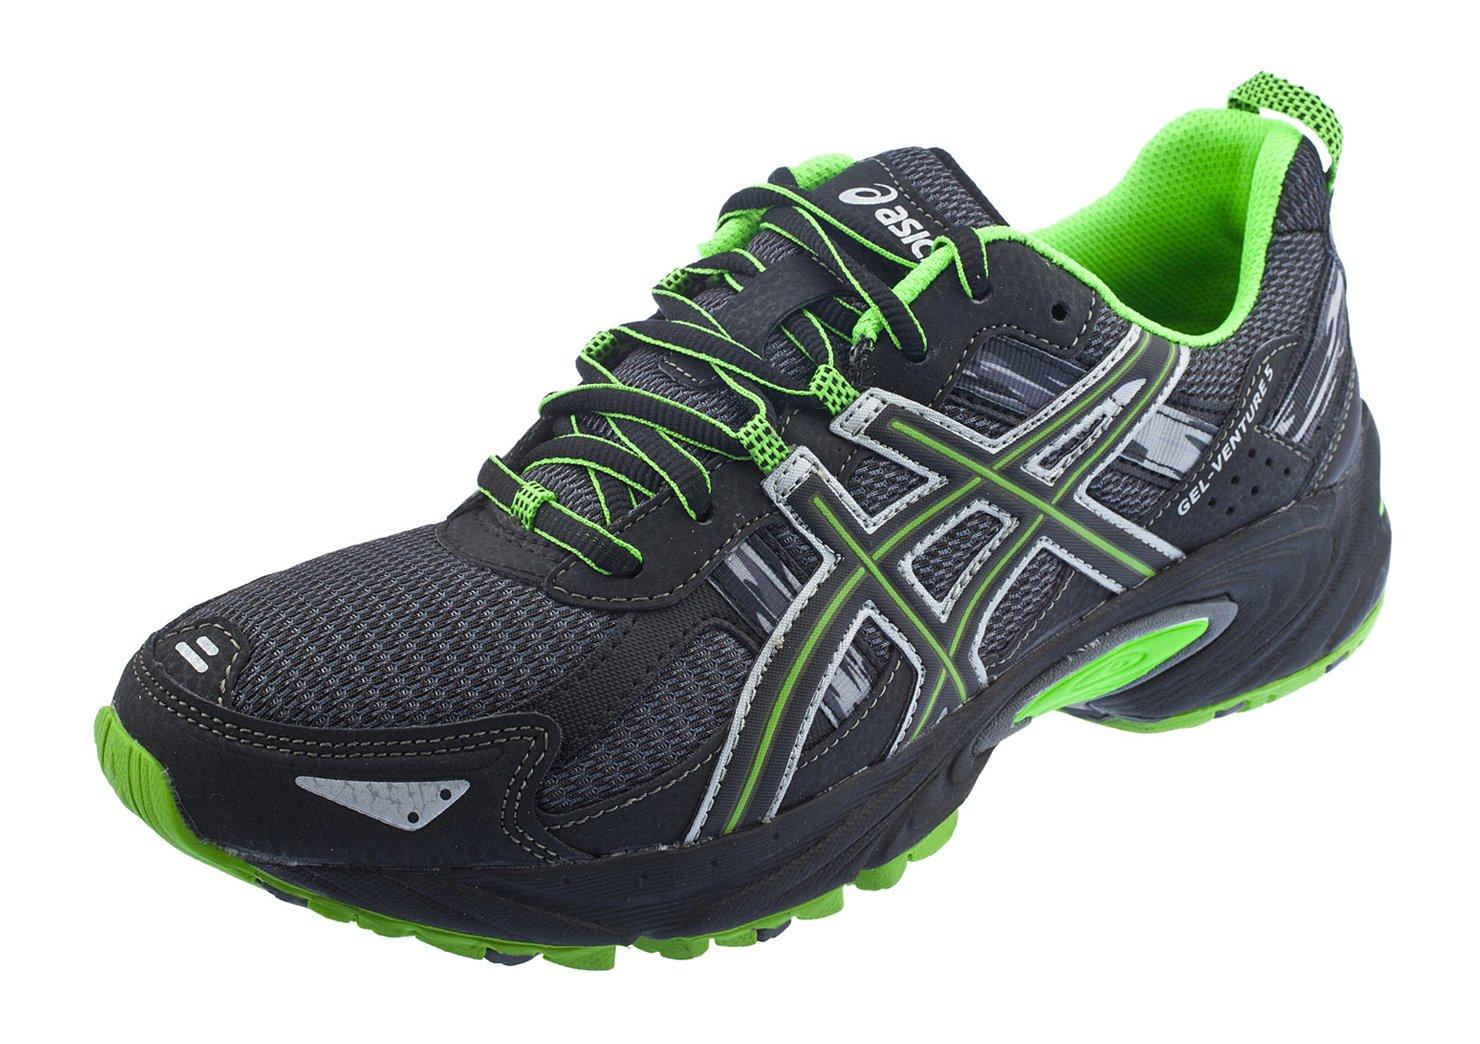 ASICS Men's GEL Venture 5 Running Shoe B06WD4ZPX7 10 D(M) US|Castle Rock/Black/Green